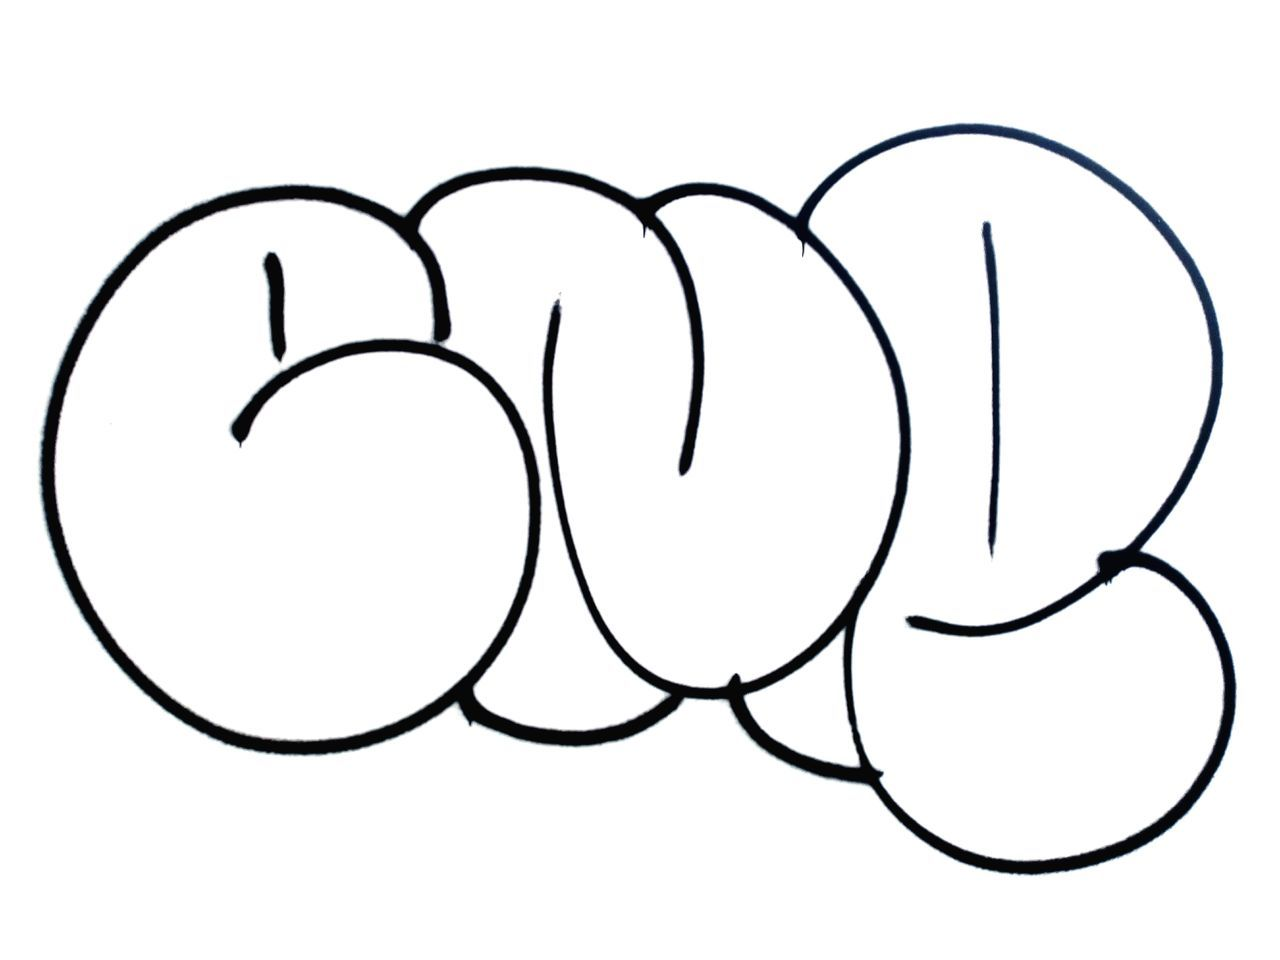 Graffiti Art Graffiti Graffiti & Streetart Tagging Aerosol Urbanphotography Spraypaint Curves And Lines Markings Street Photography Lines, Shapes And Curves Textures And Surfaces Photographic Wall - Building Feature Outdoors Building Exterior Full Frame